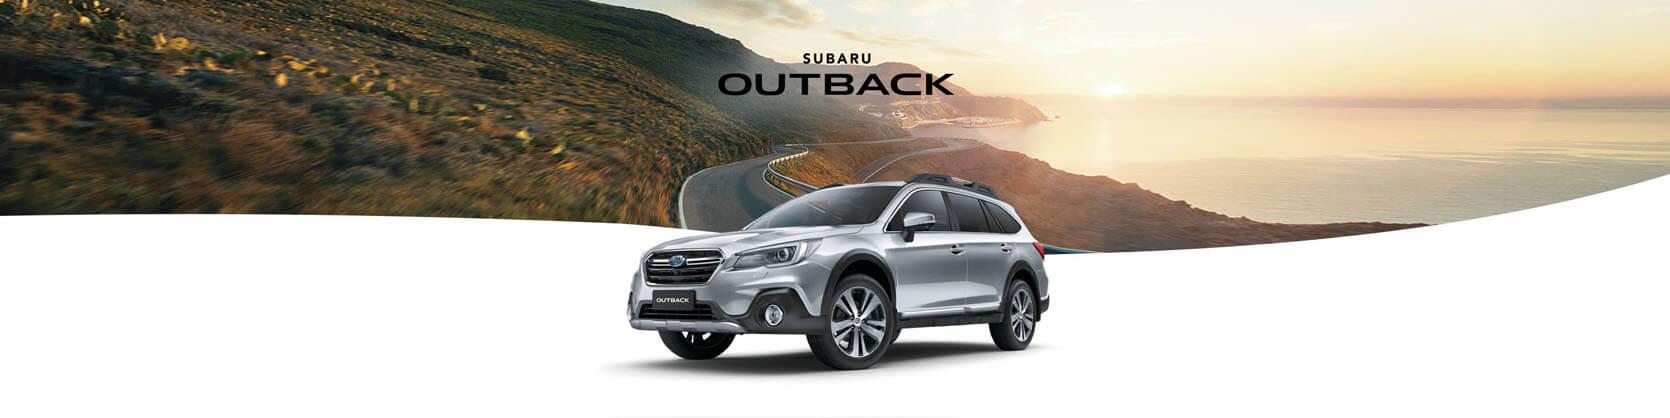 New Subaru Outback for sale in Brisbane - Cricks Highway Subaru